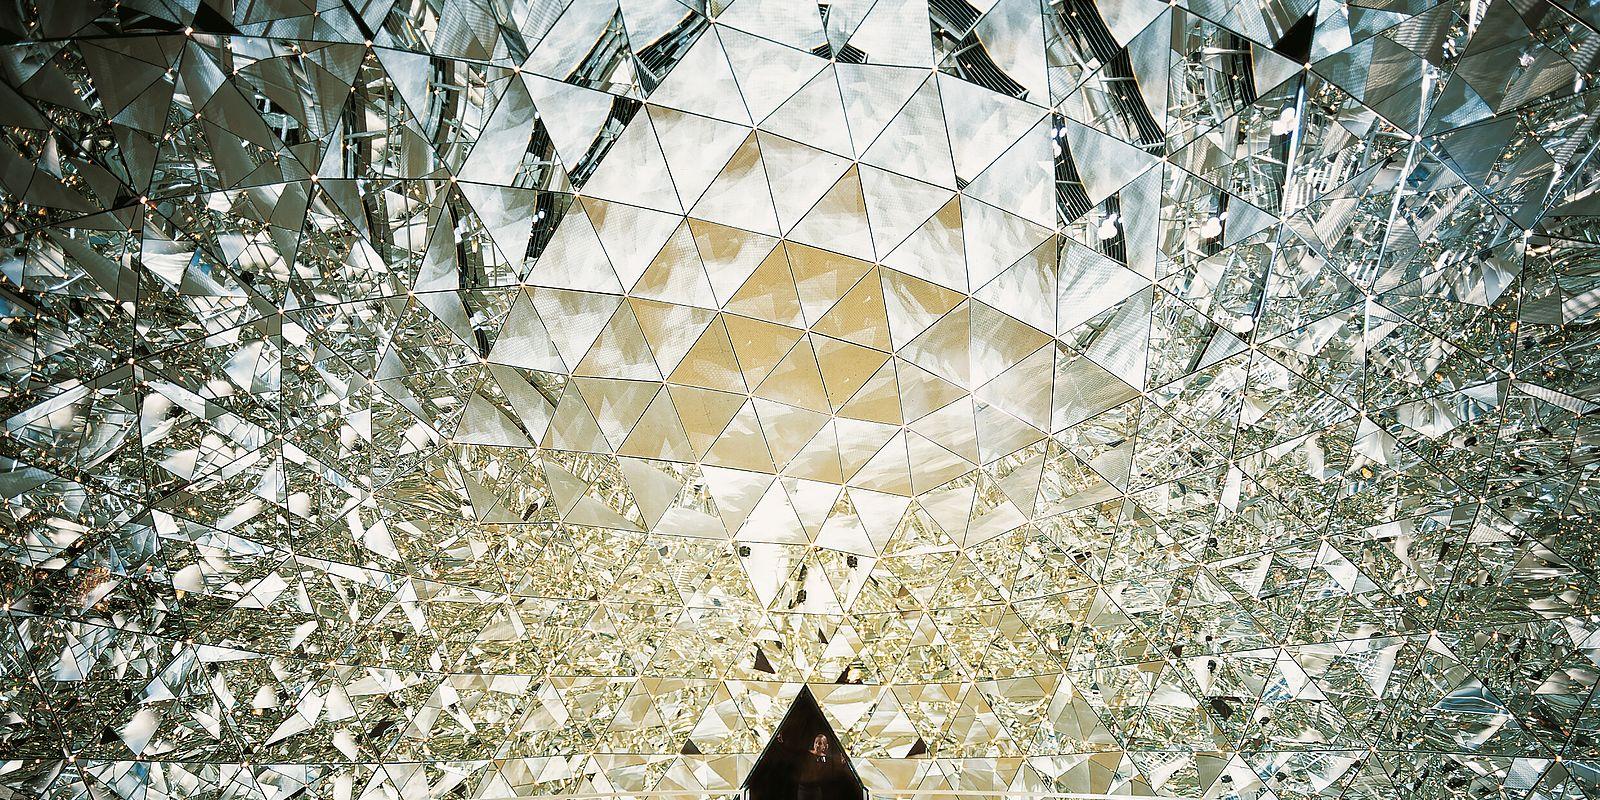 Kristalldom © Swarovski Kristallwelten / Walter Oczlon